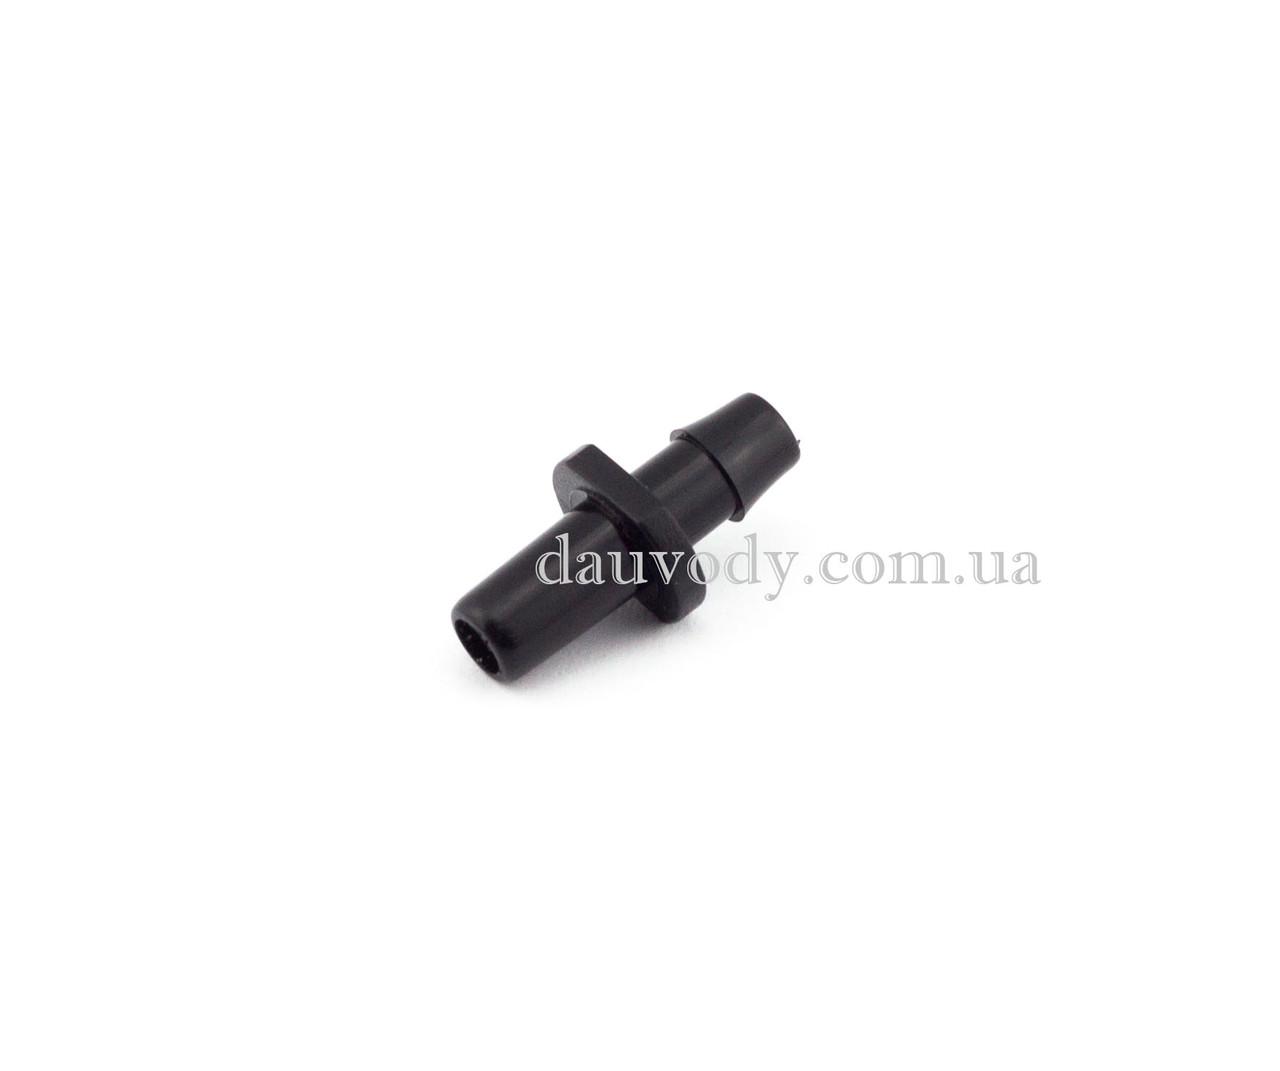 Адаптер для трубки 3,5 мм (раздаточной)